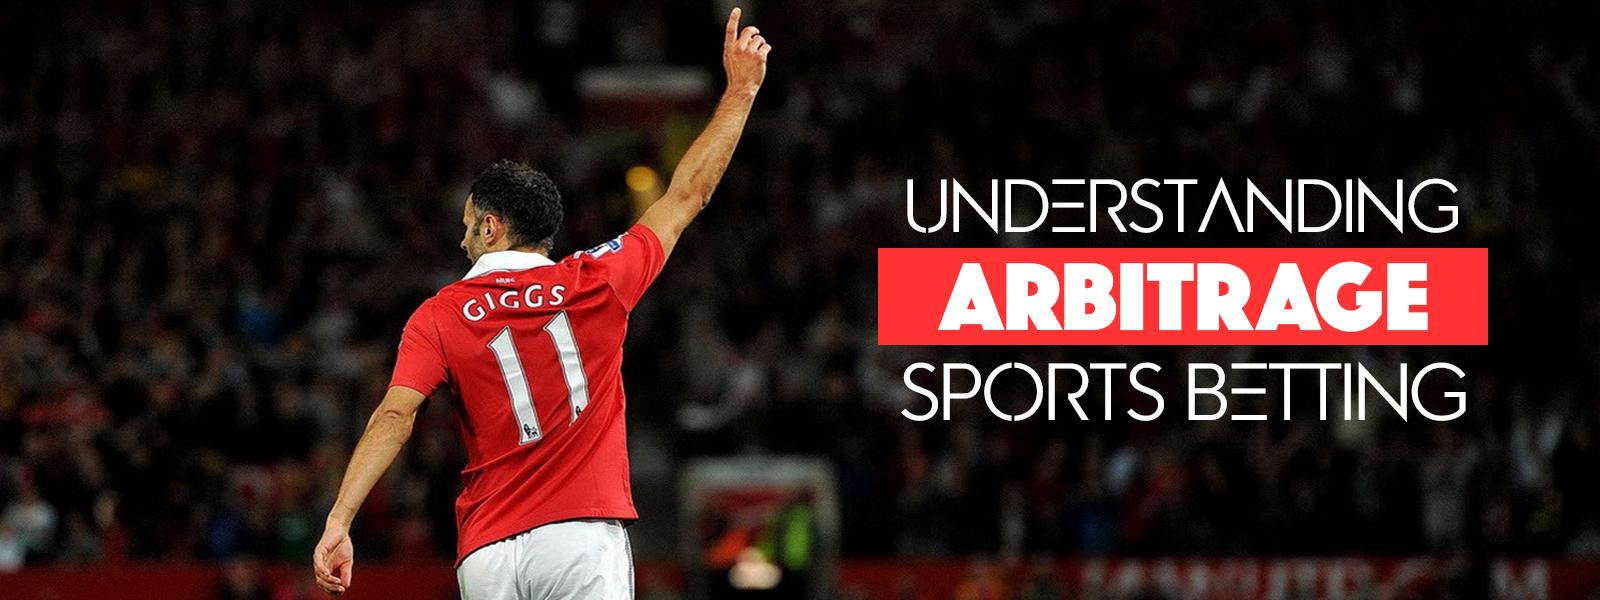 Understanding Arbitrage Sports Betting